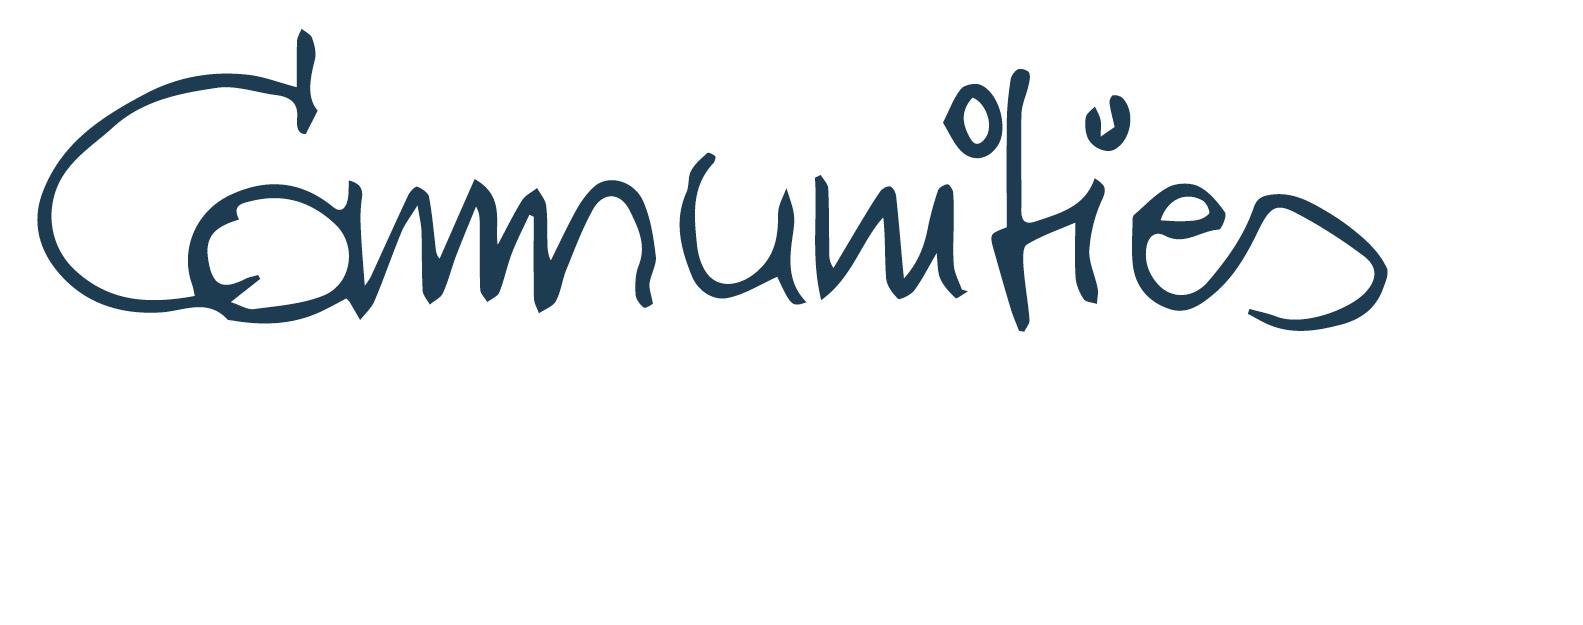 Comunities